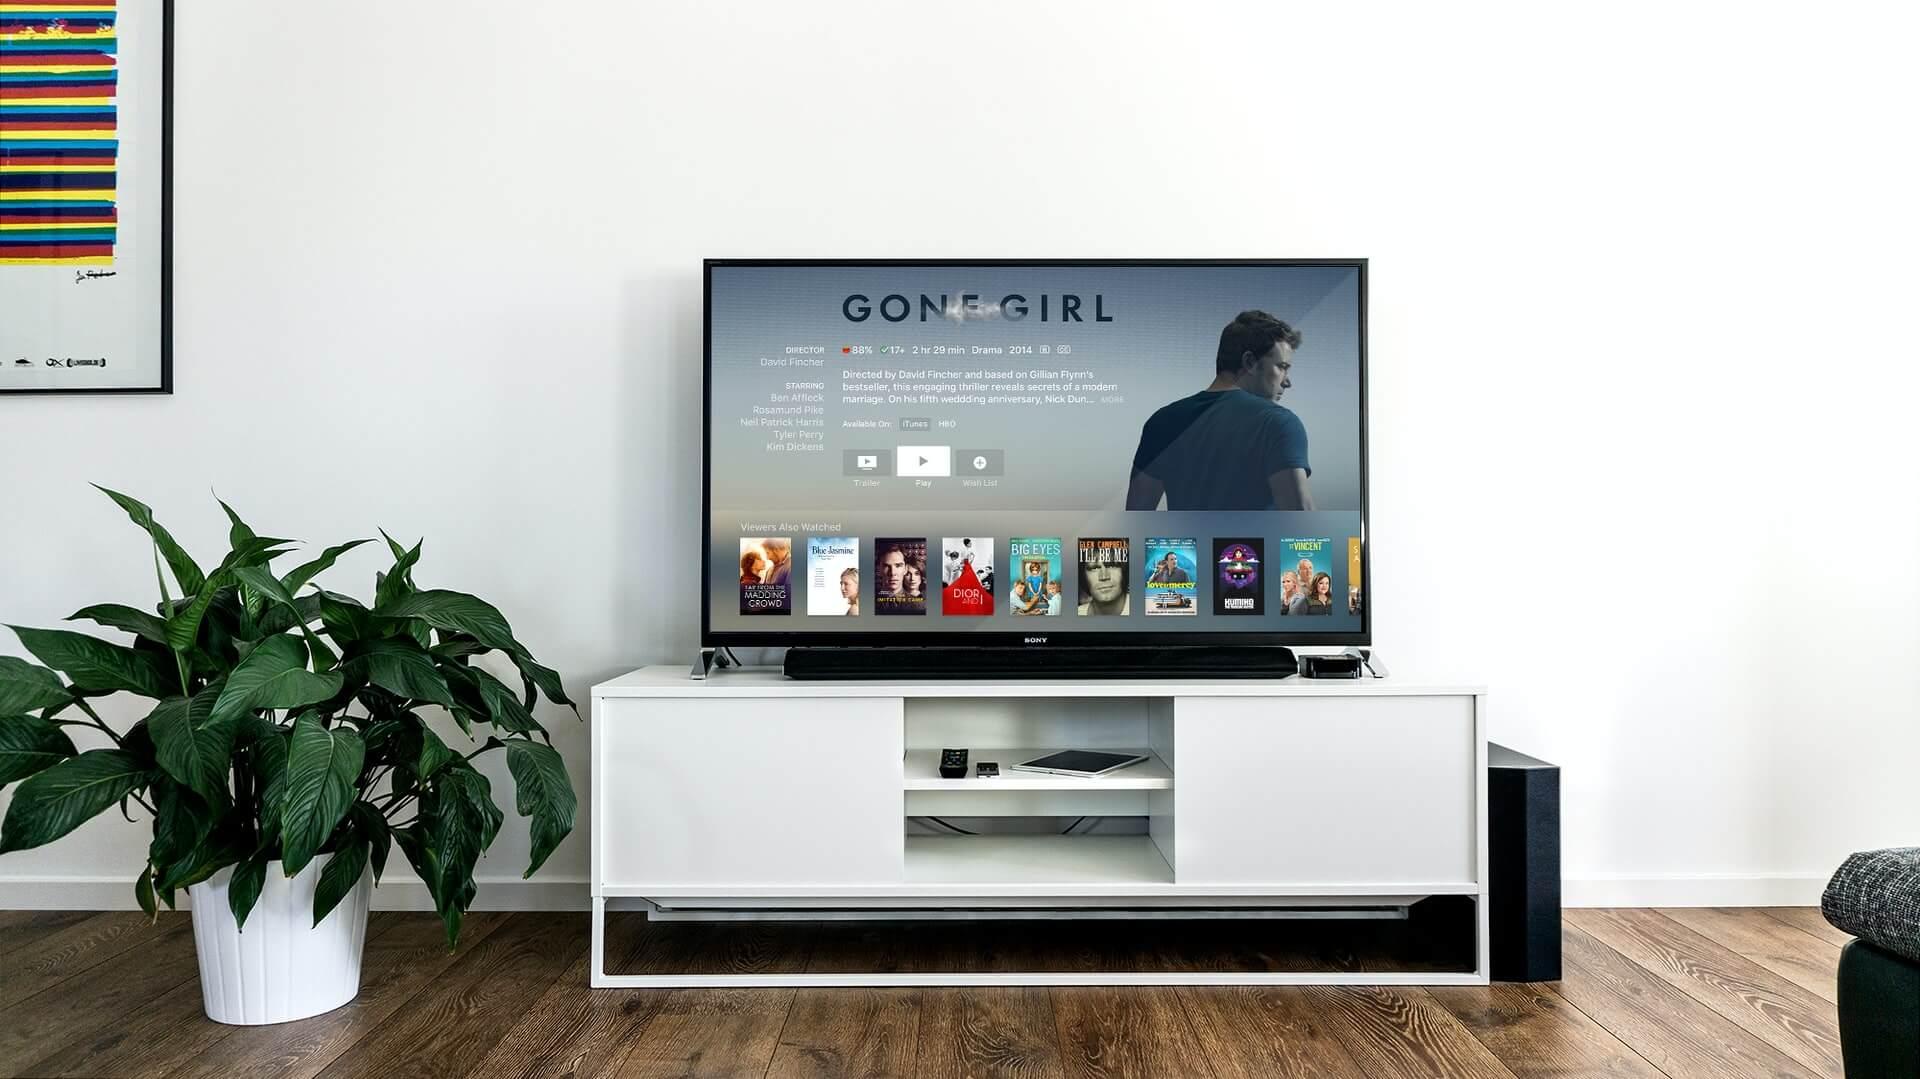 Smart TVs for entertainment